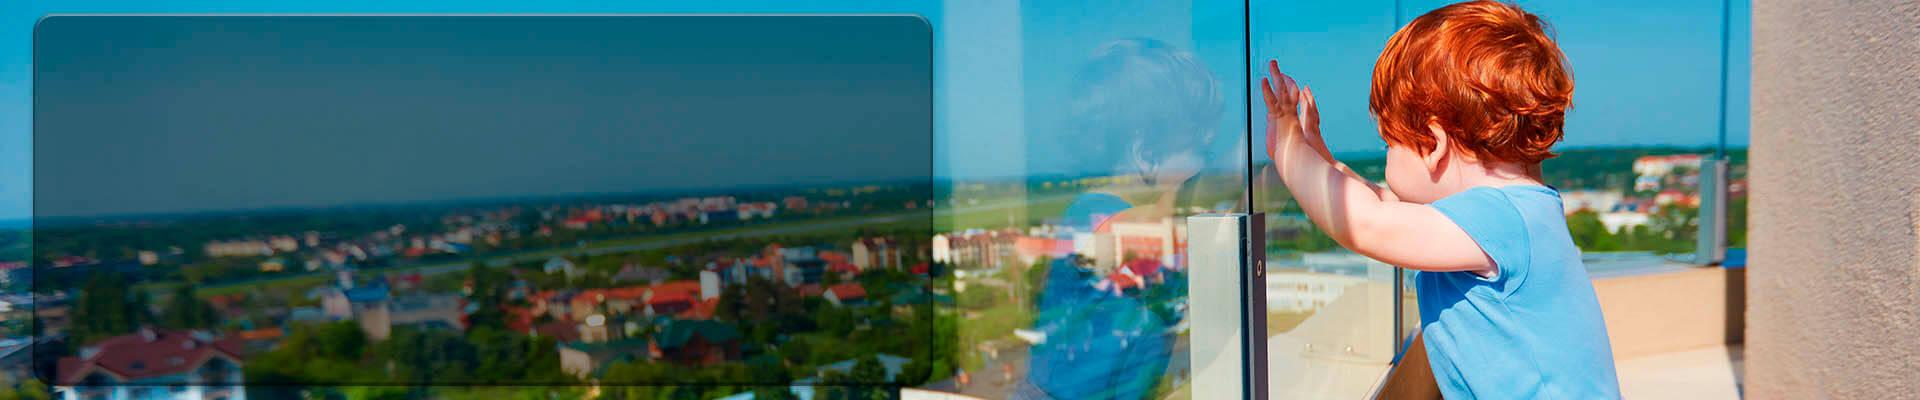 Slide de vidrio laminado Lamimass